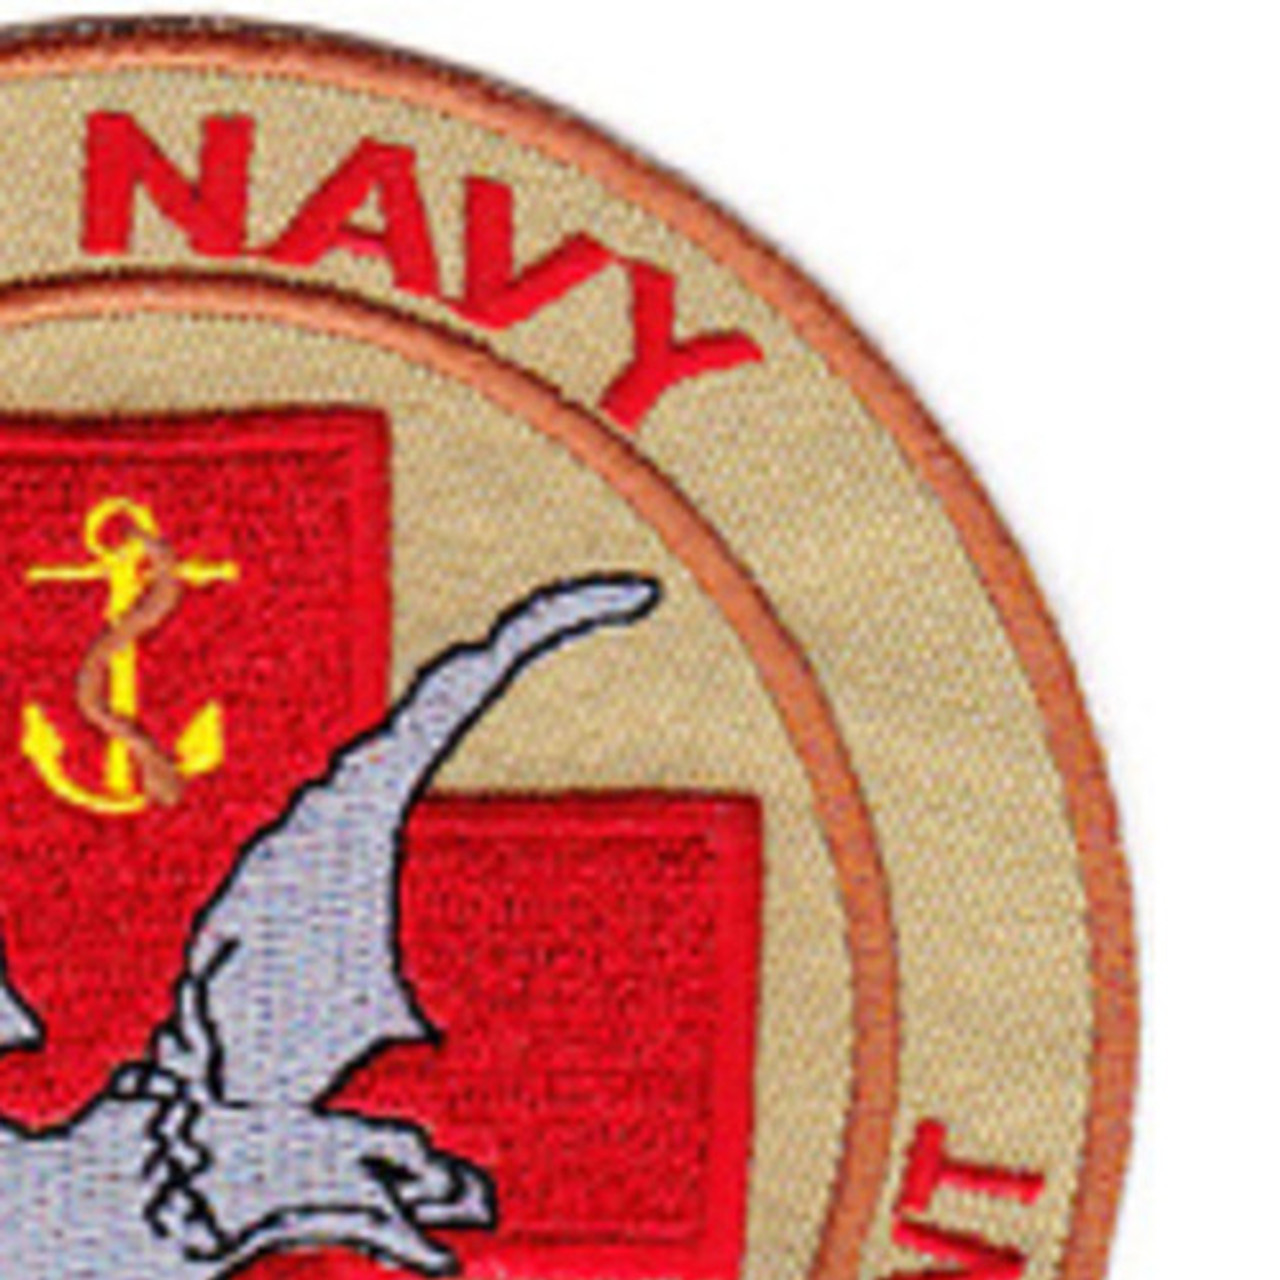 2515th NAAD Naval Air Ambulance Detachment patch